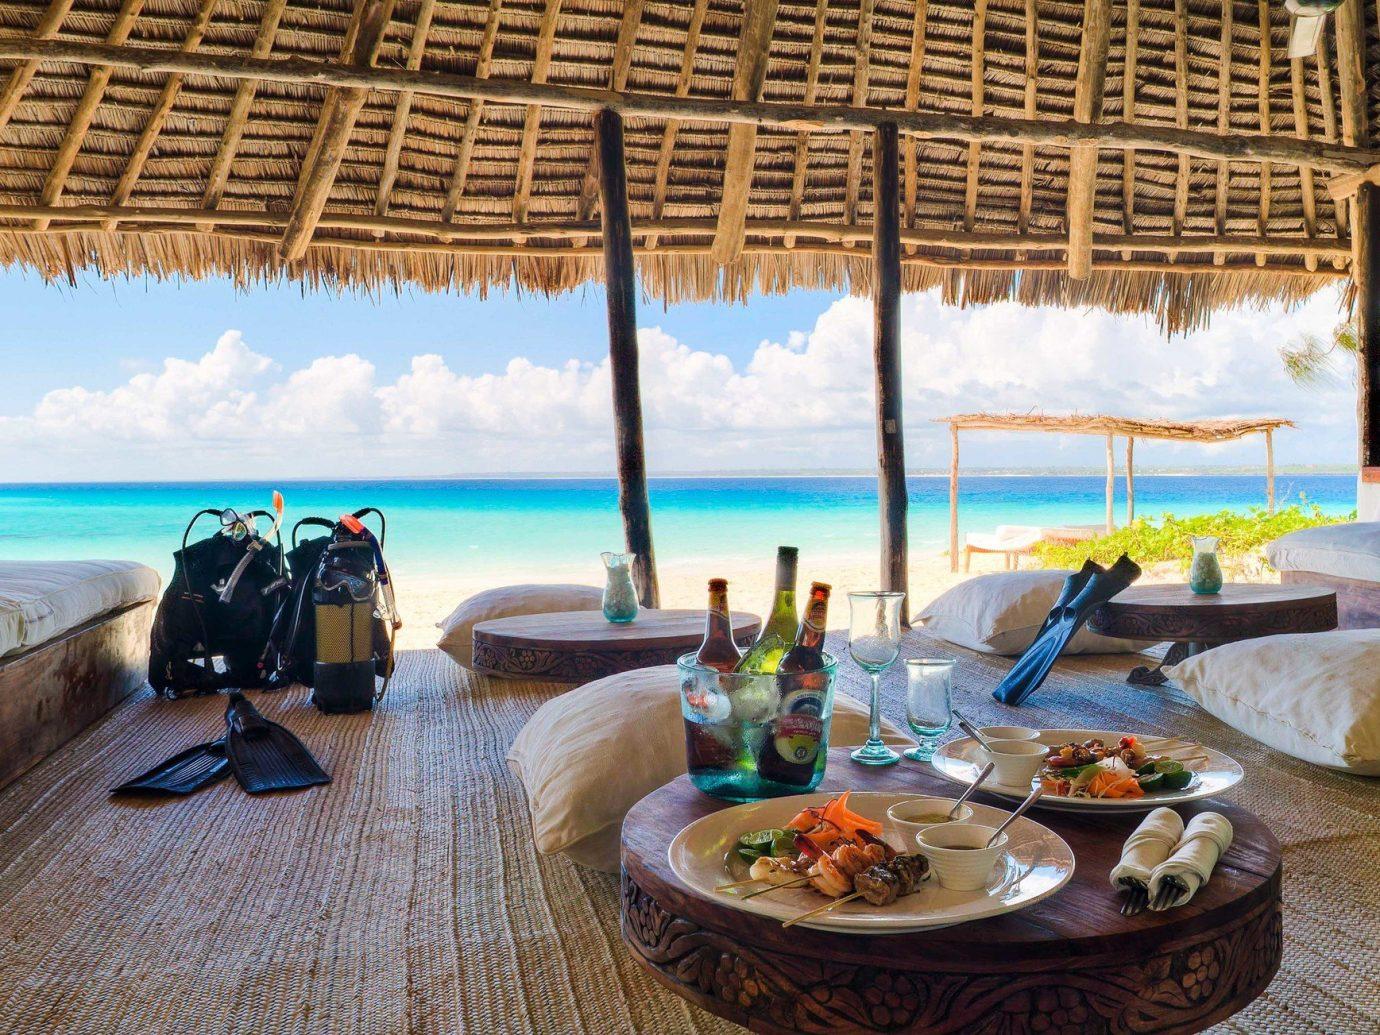 beach front lunch spread at andBeyond Mnemba Island, Zanzibar